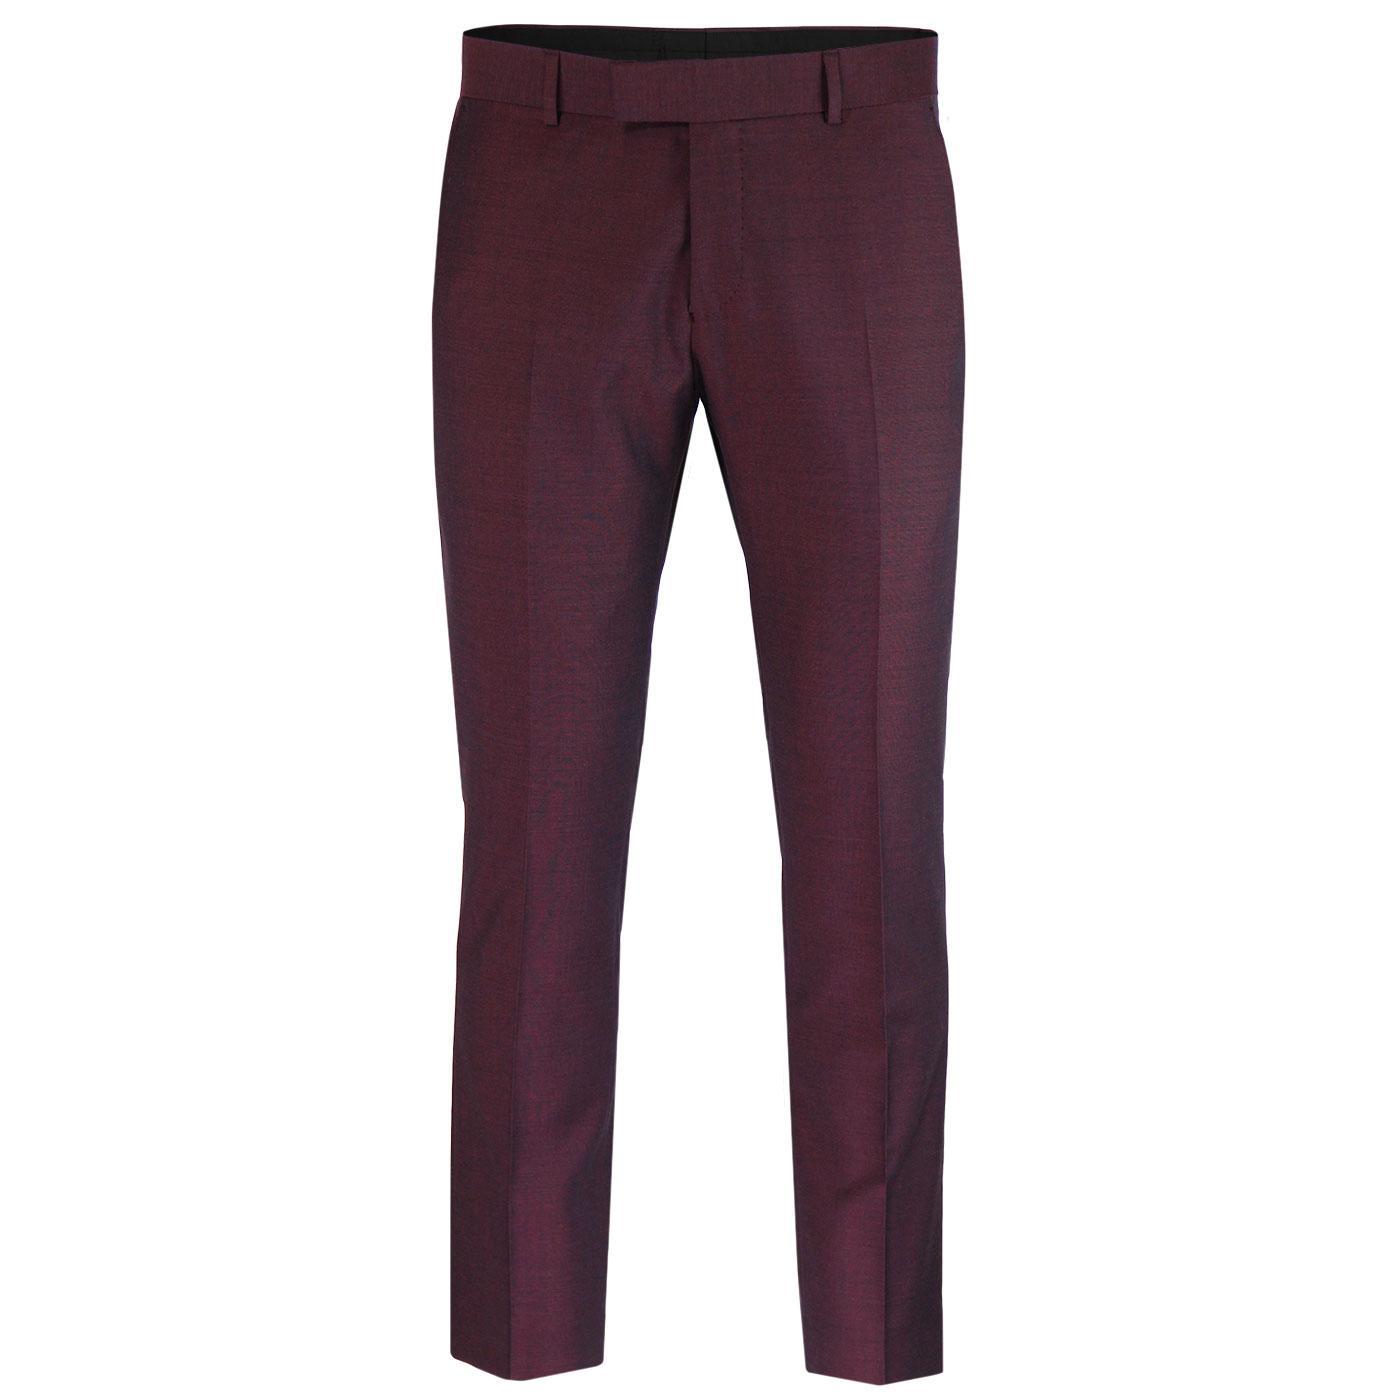 MADCAP ENGLAND Mod Mohair Tonic Trousers BURGUNDY